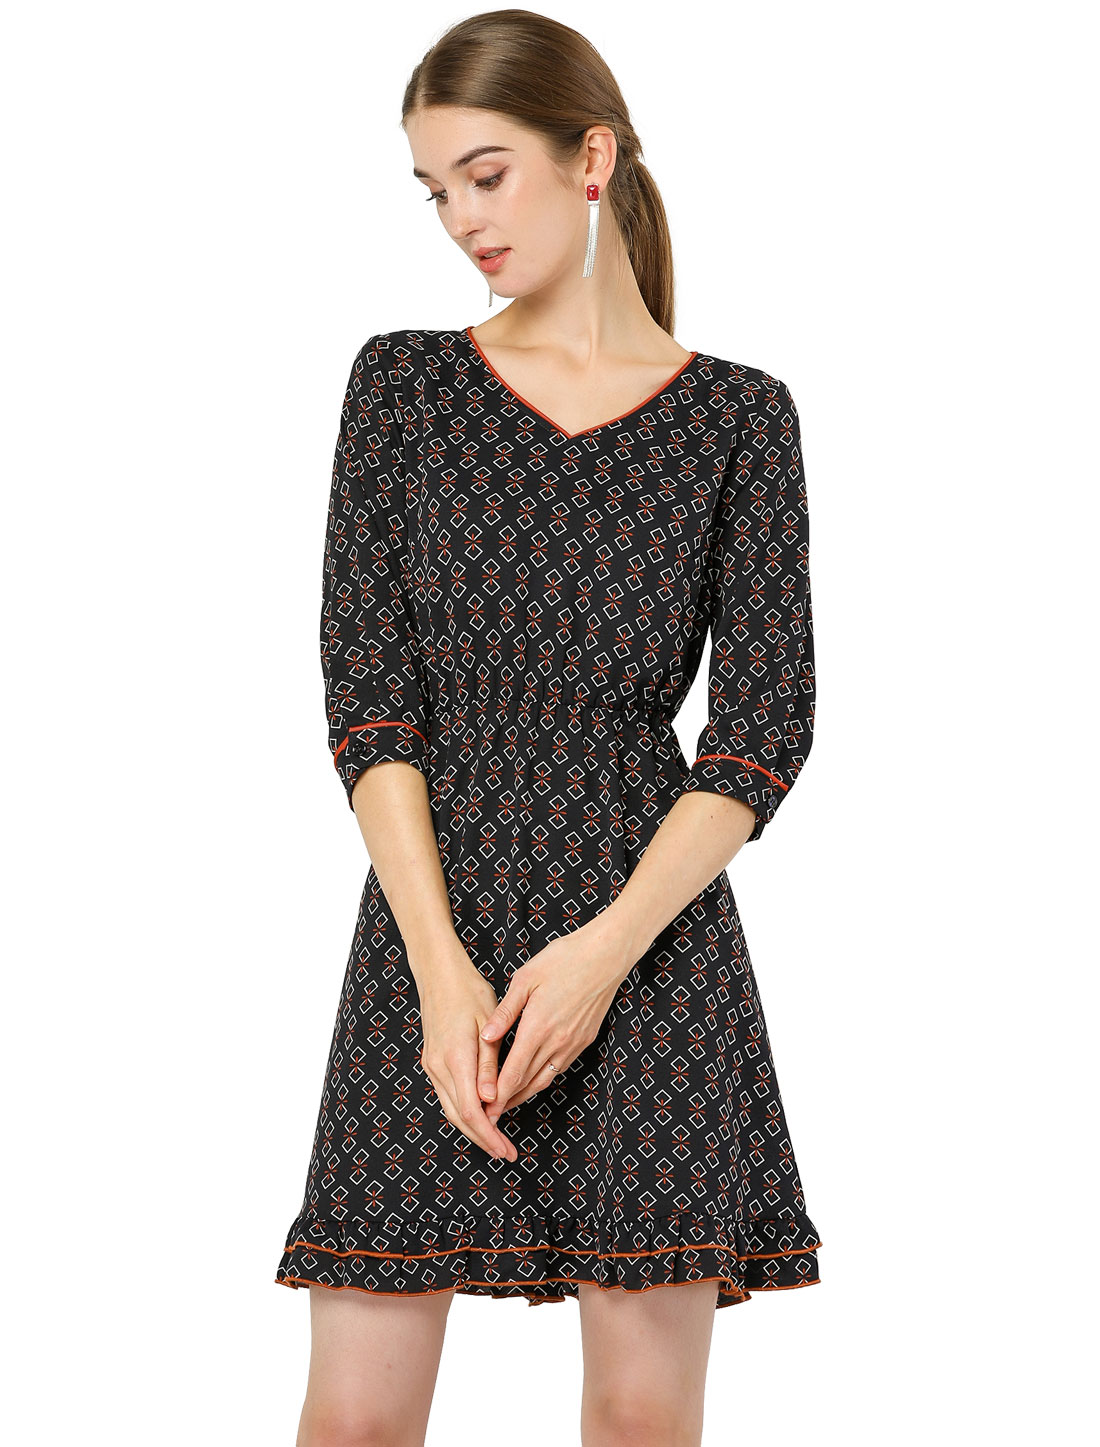 Women's V Neck Ruffle Hem Geometric Motifs Flare Chiffon Dress Navy Blue L